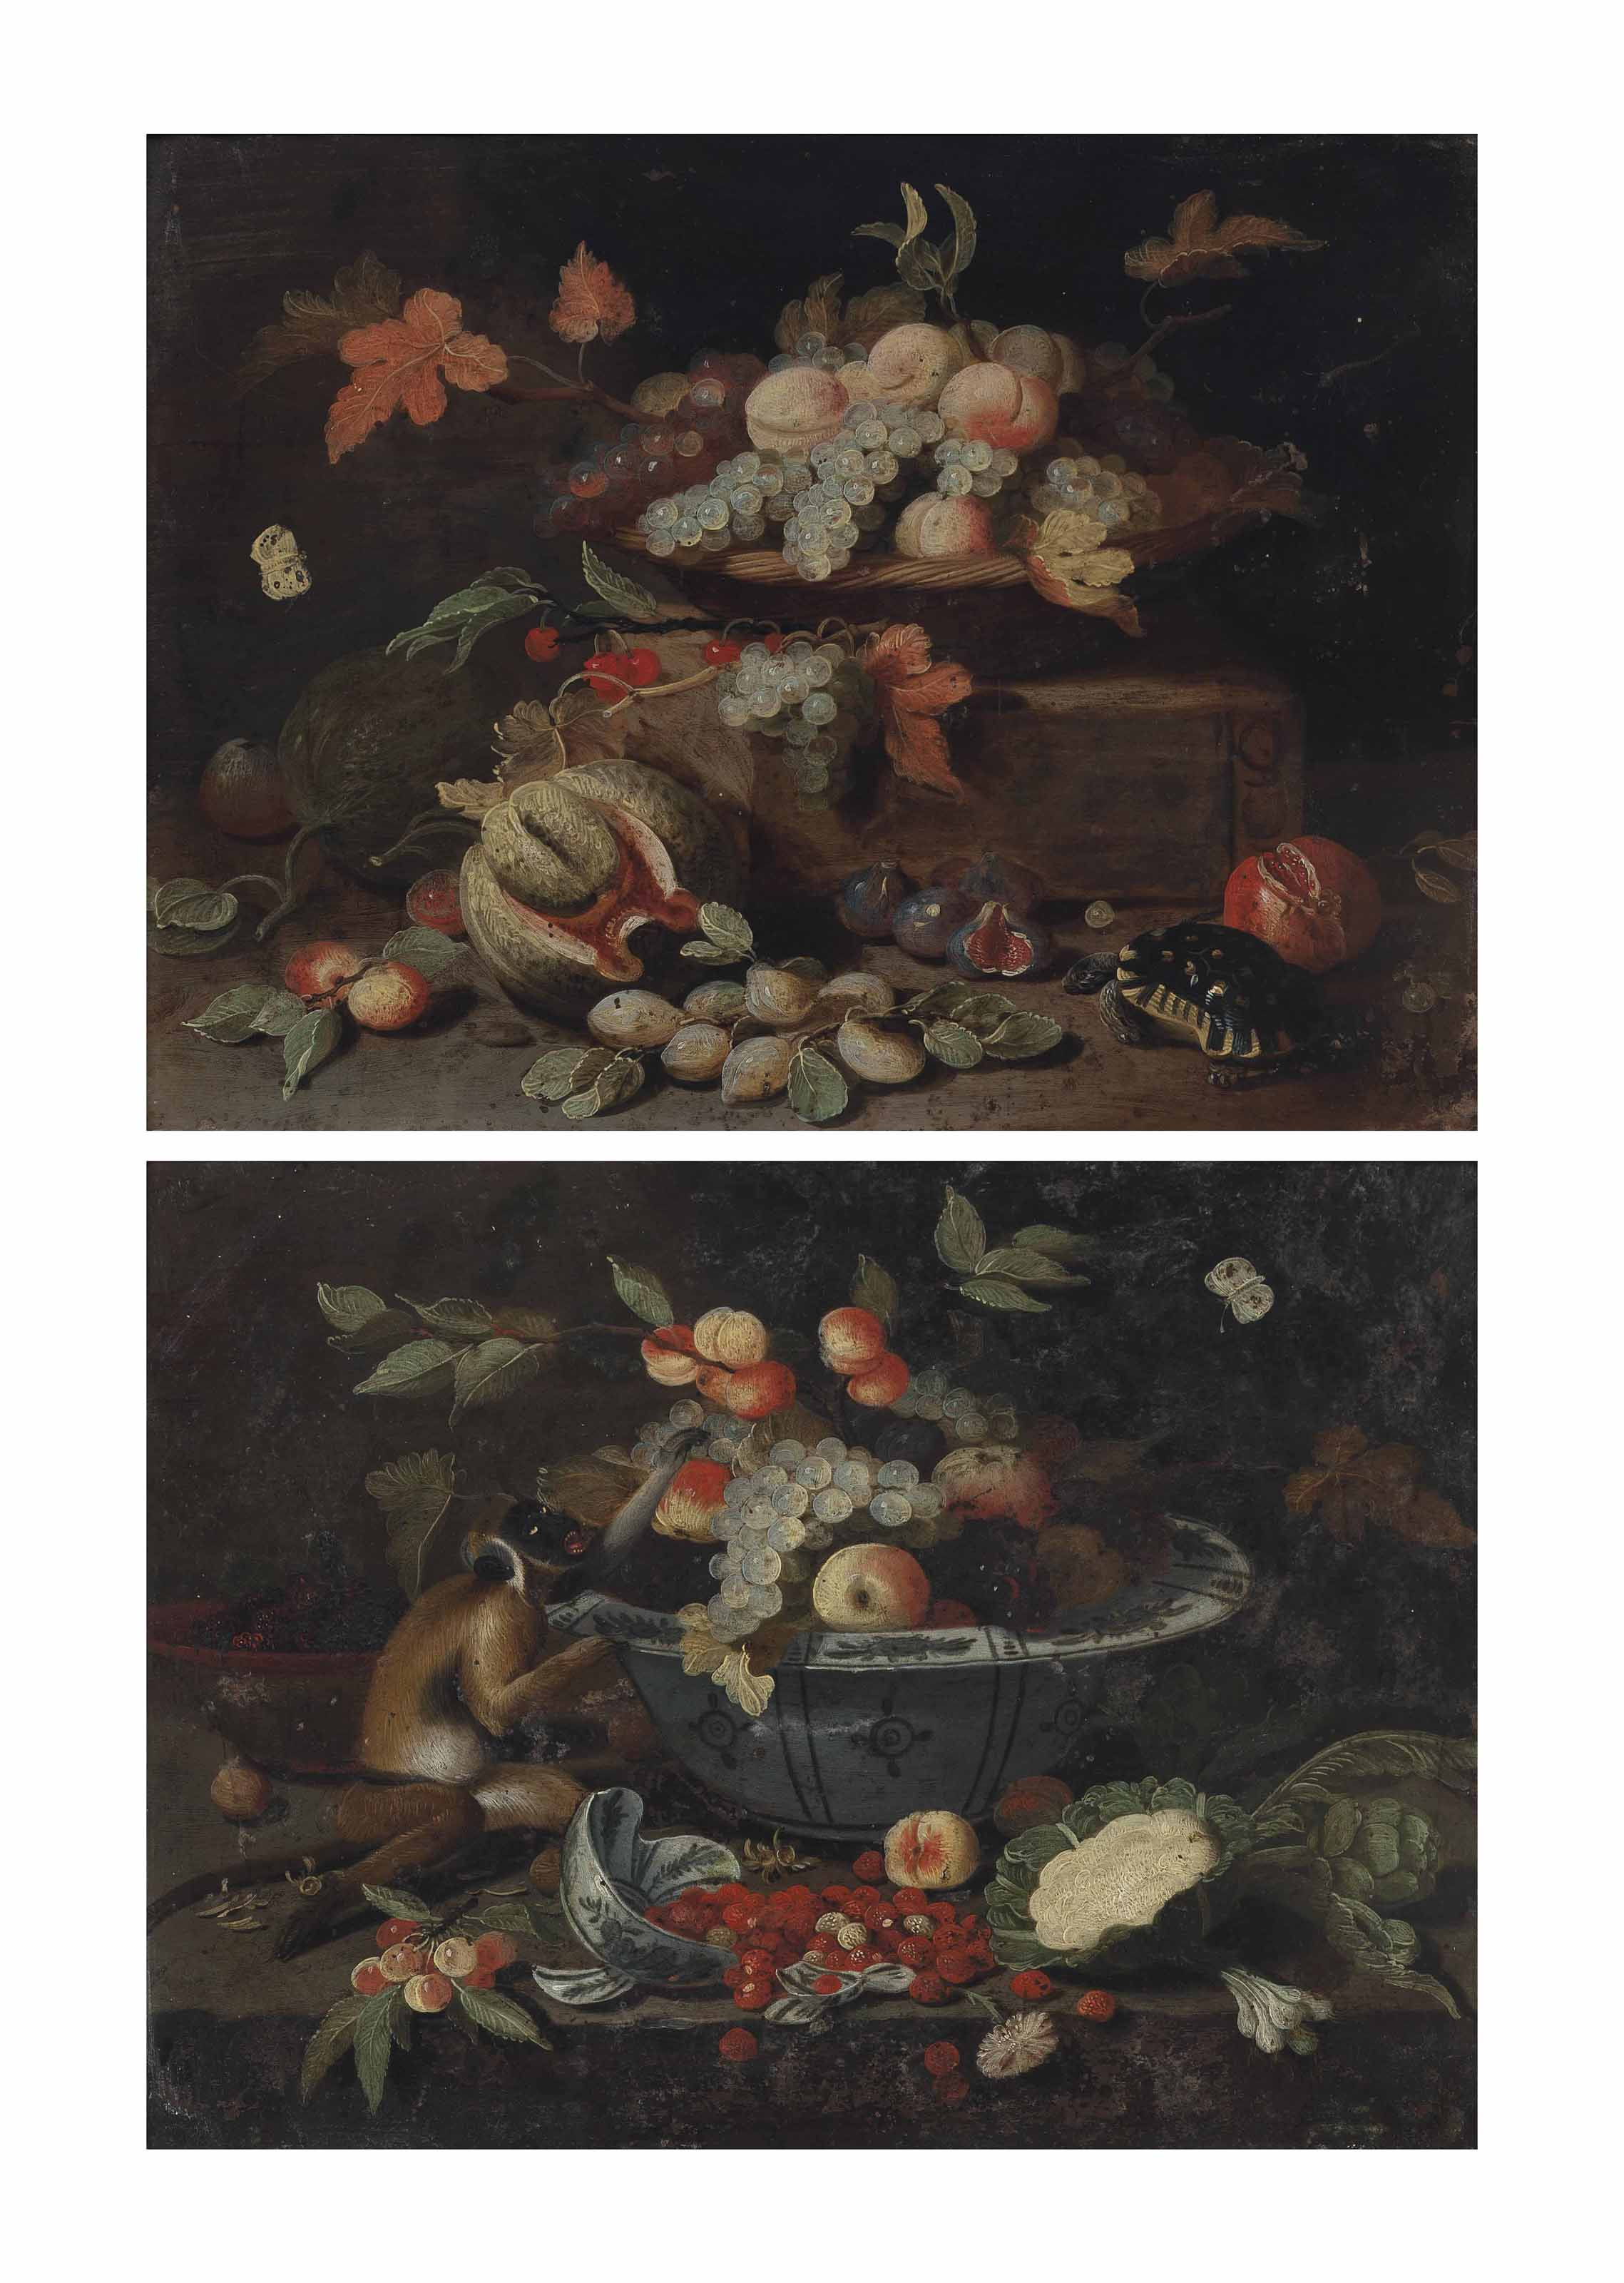 Pseudo Jan van Kessel II (active second half 17th century)